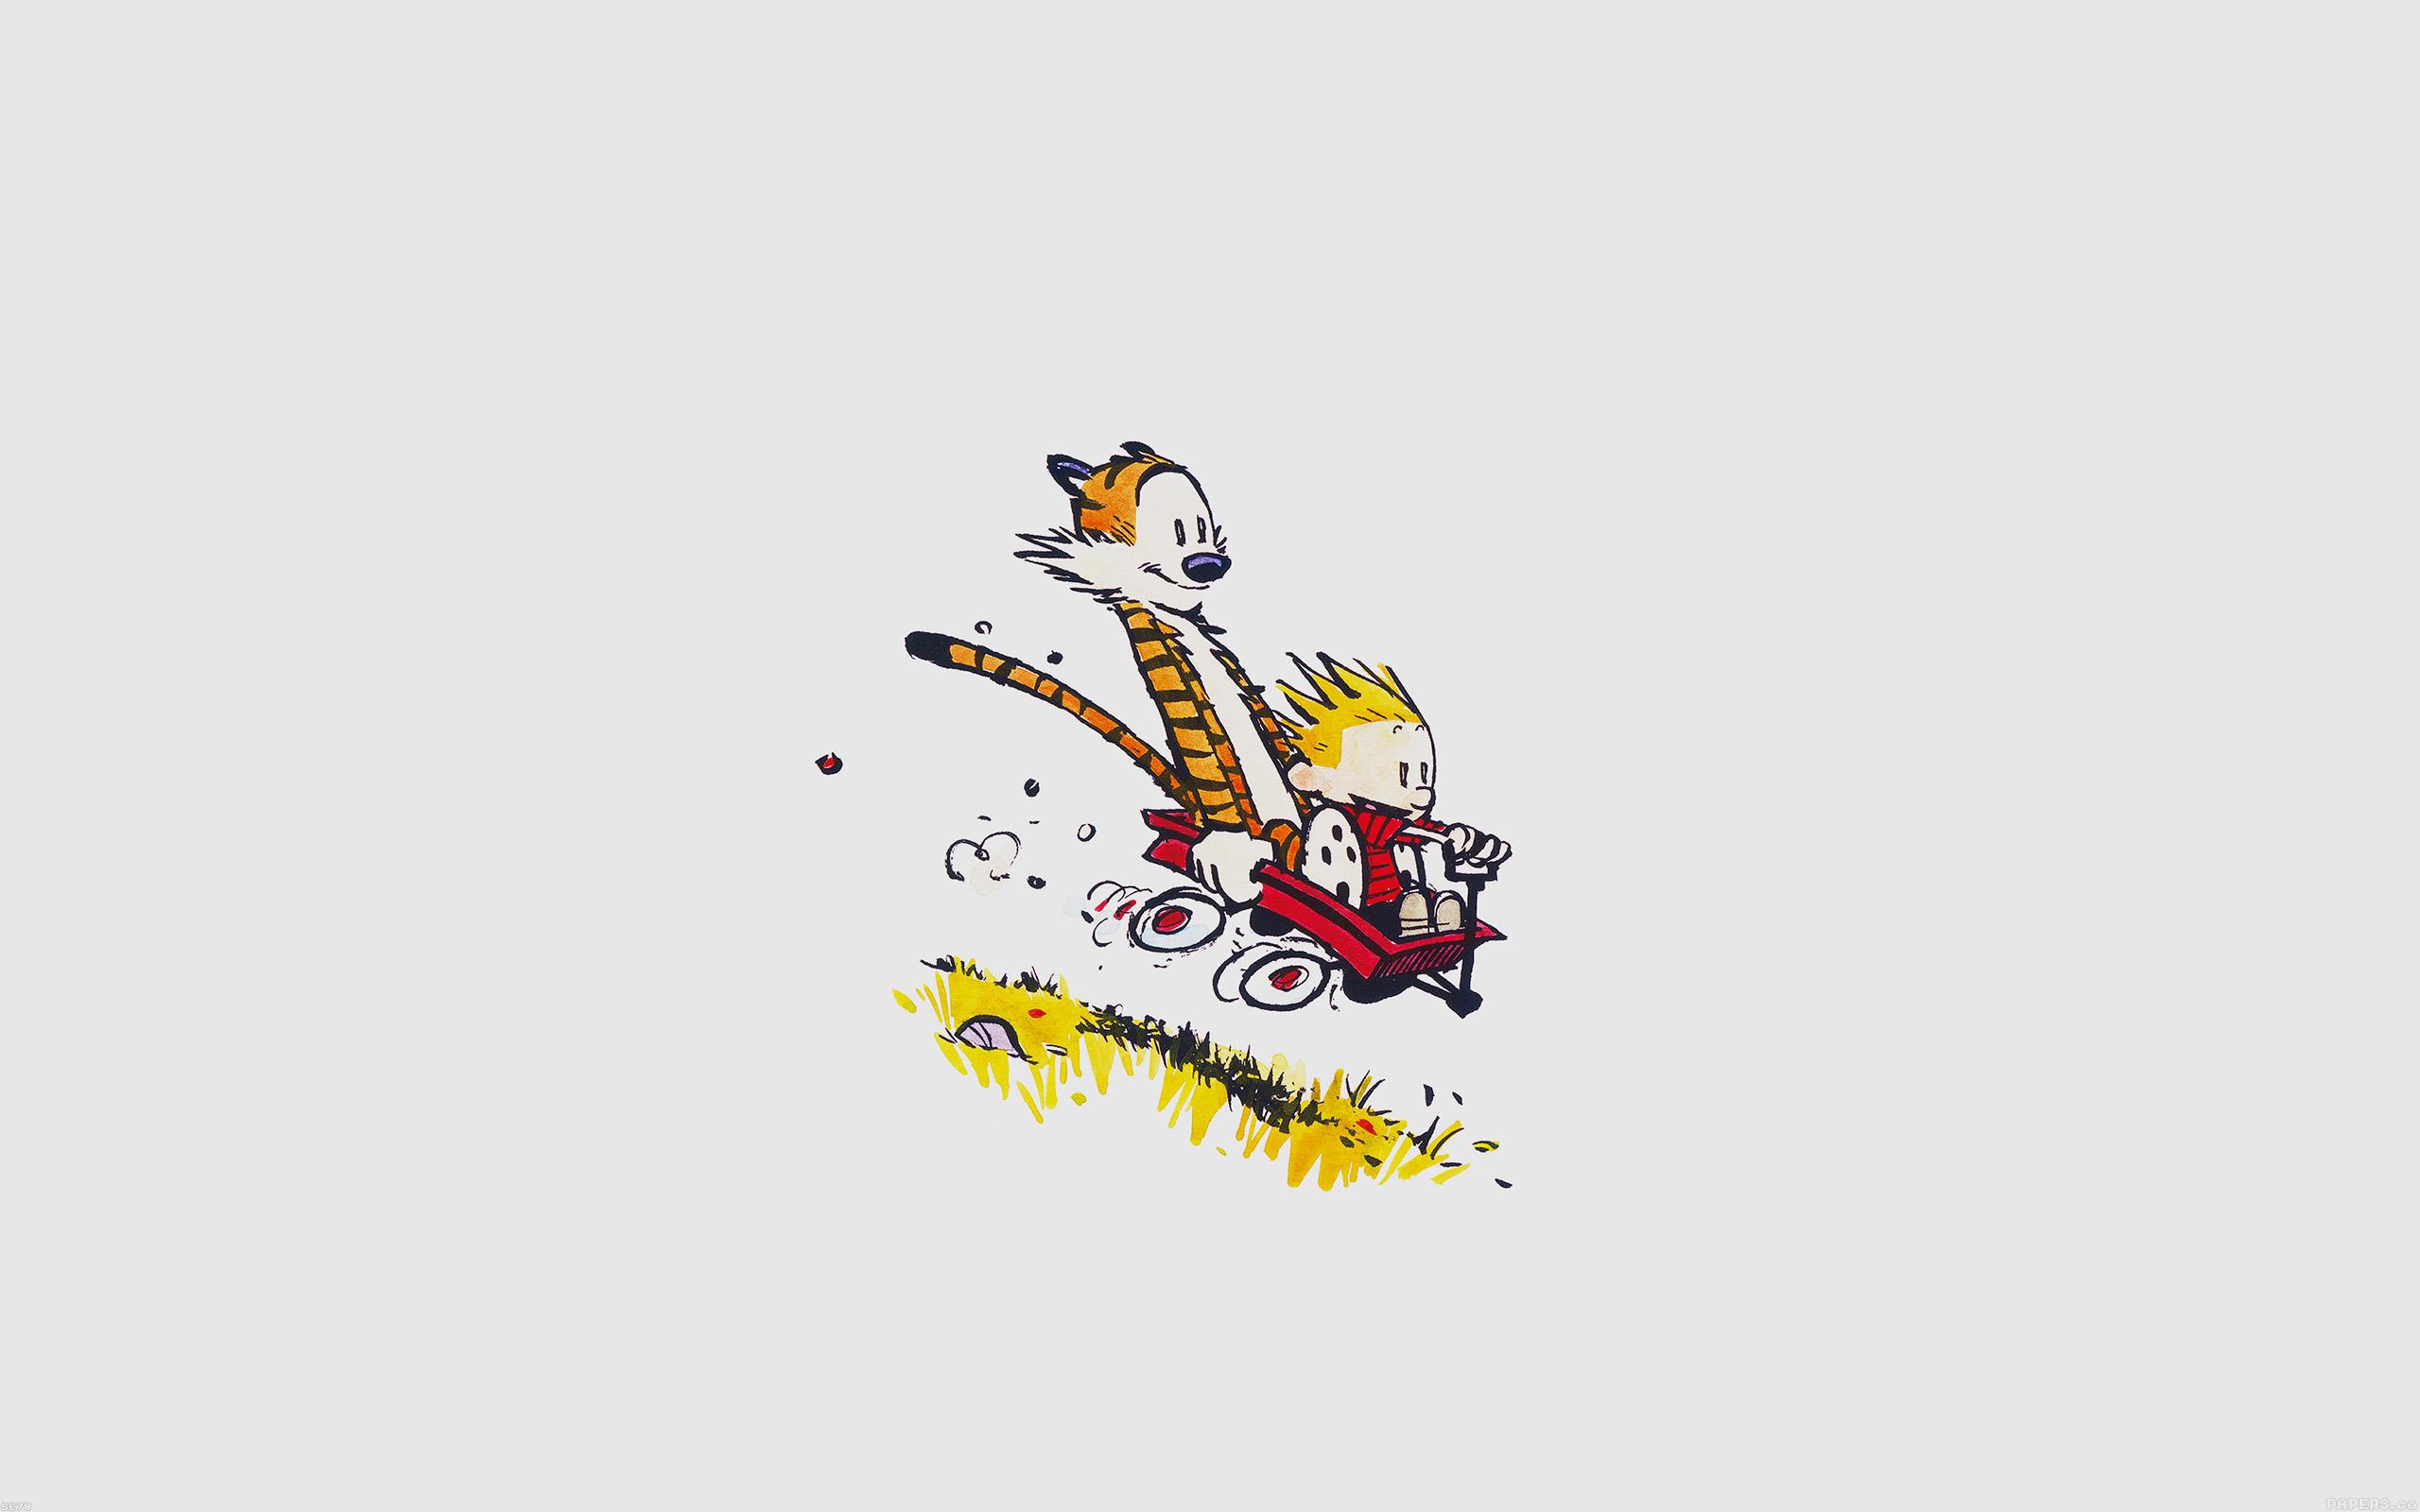 af62-calvin-hobbes-happy-times-cartoon-wallpaper